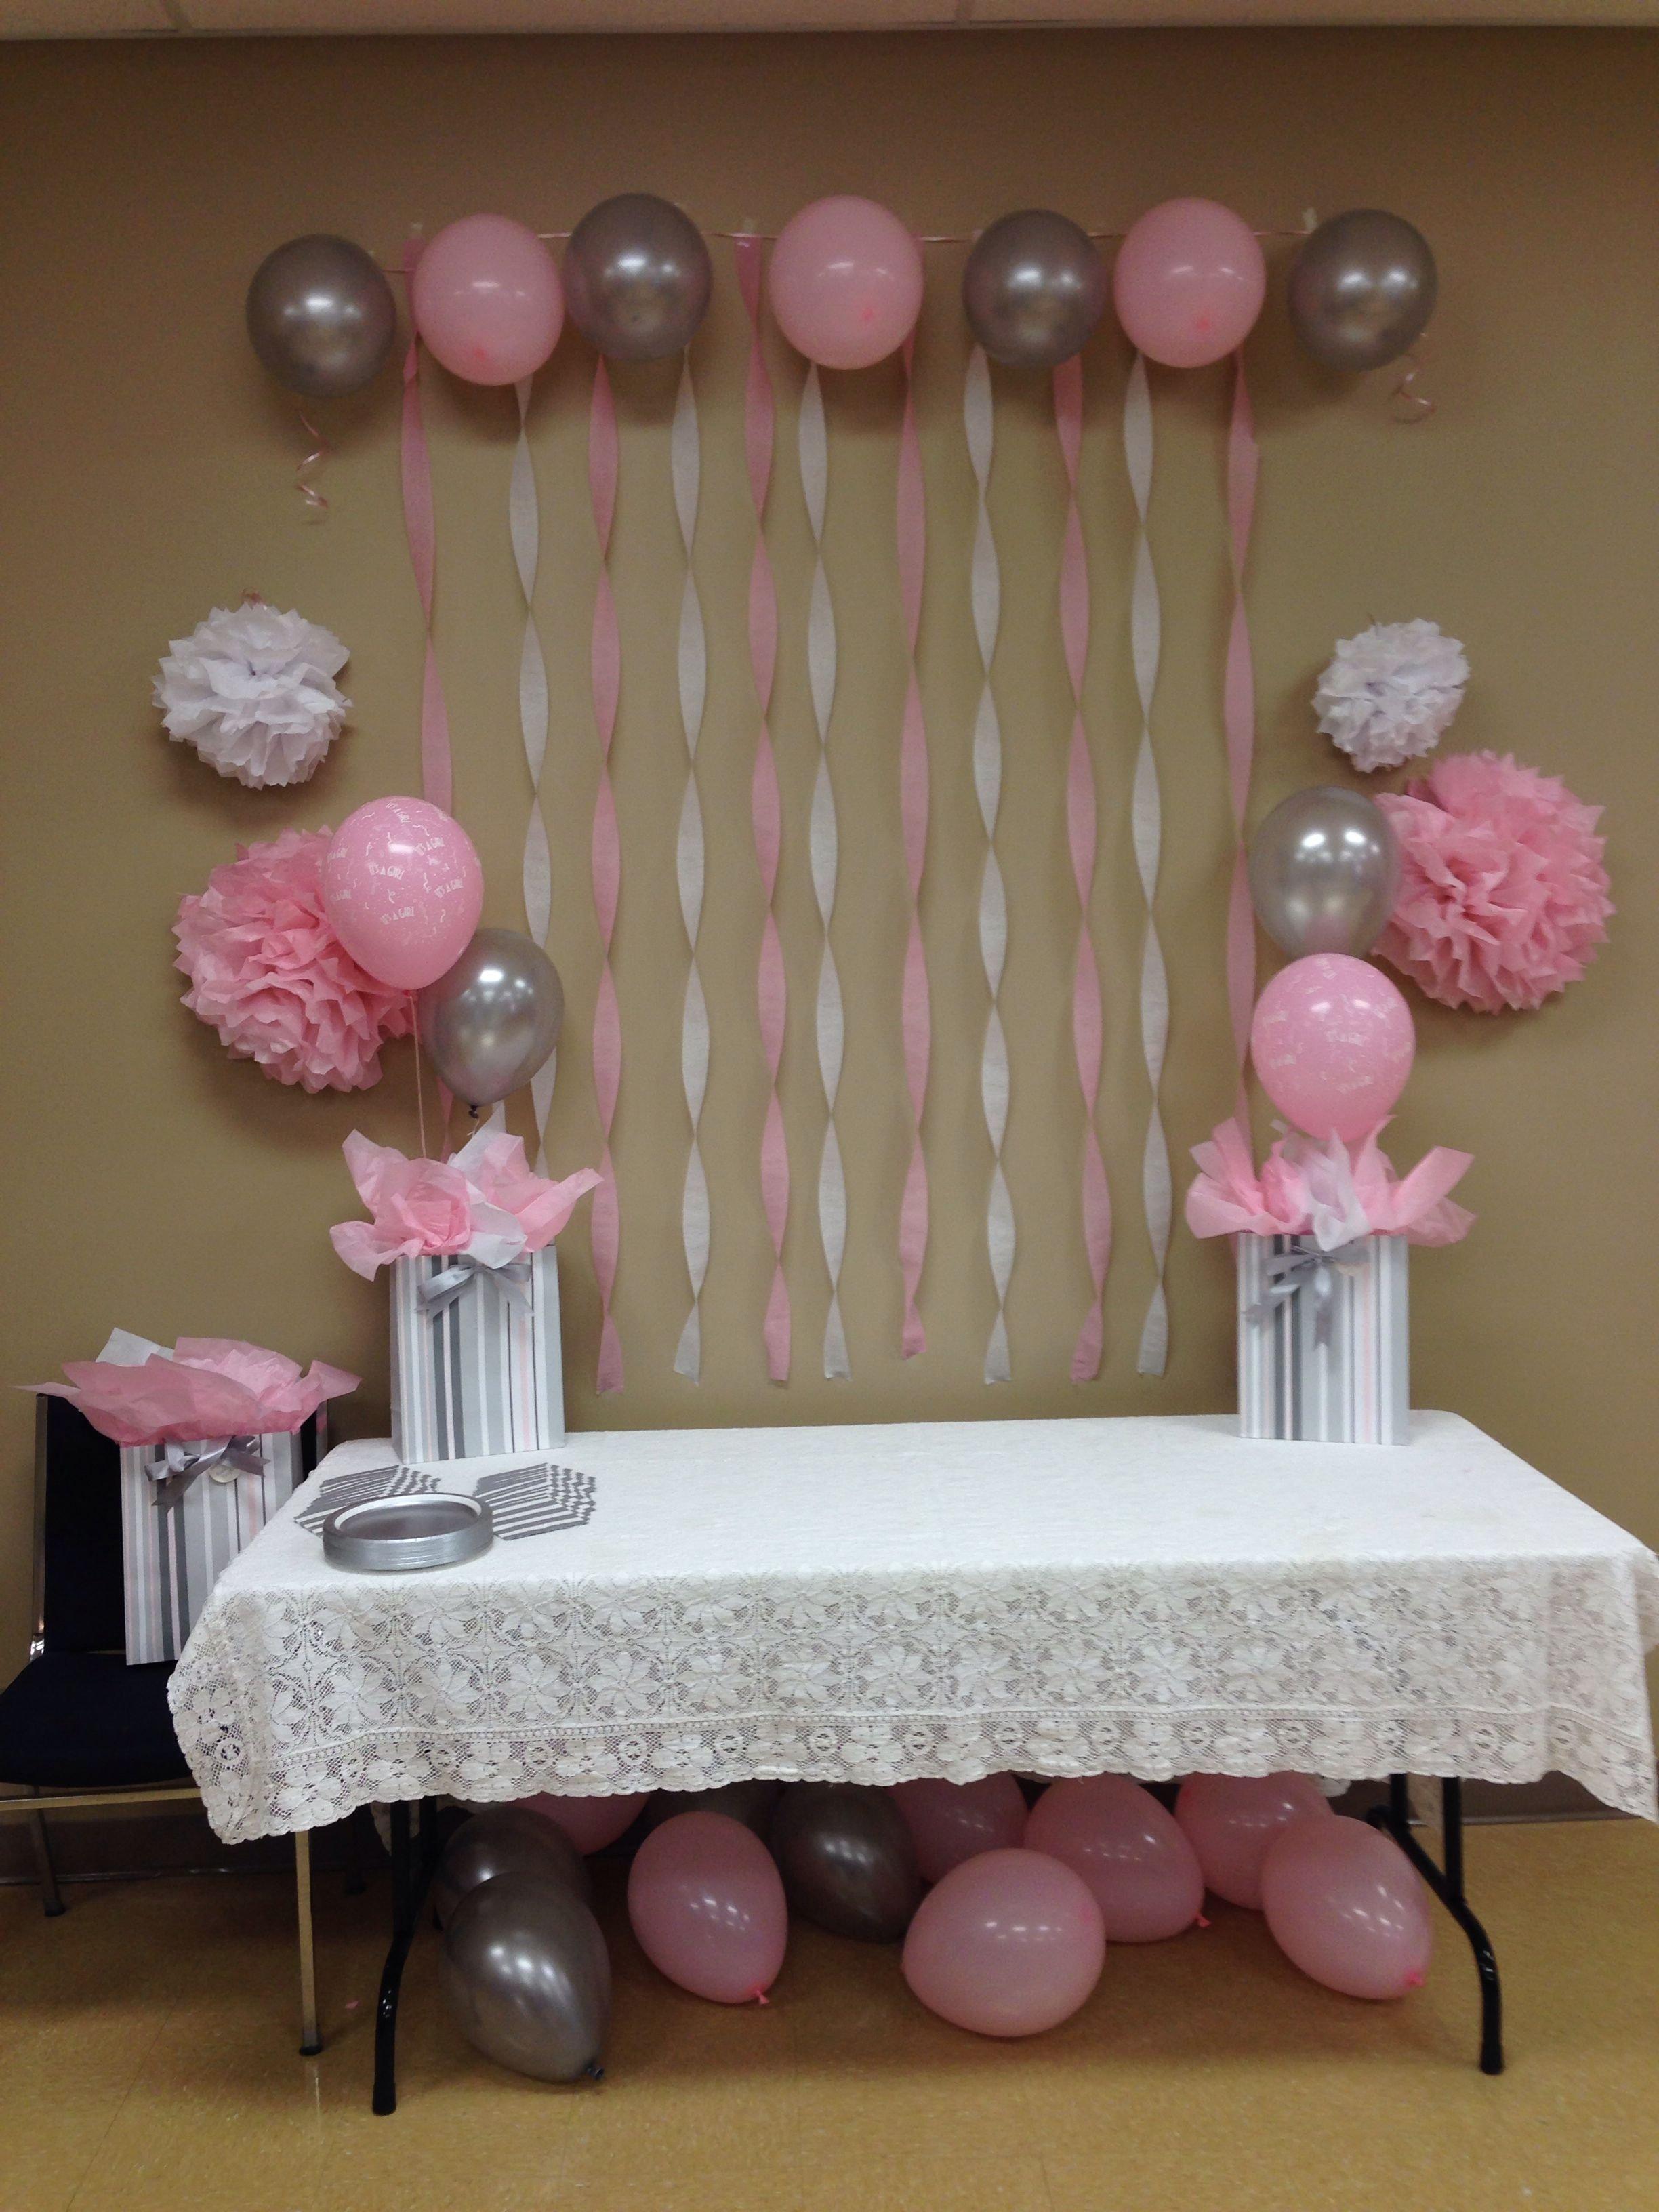 10 Fashionable Baby Girl Baby Shower Ideas light pink grey white baby shower baby shower ideas for girls 2021